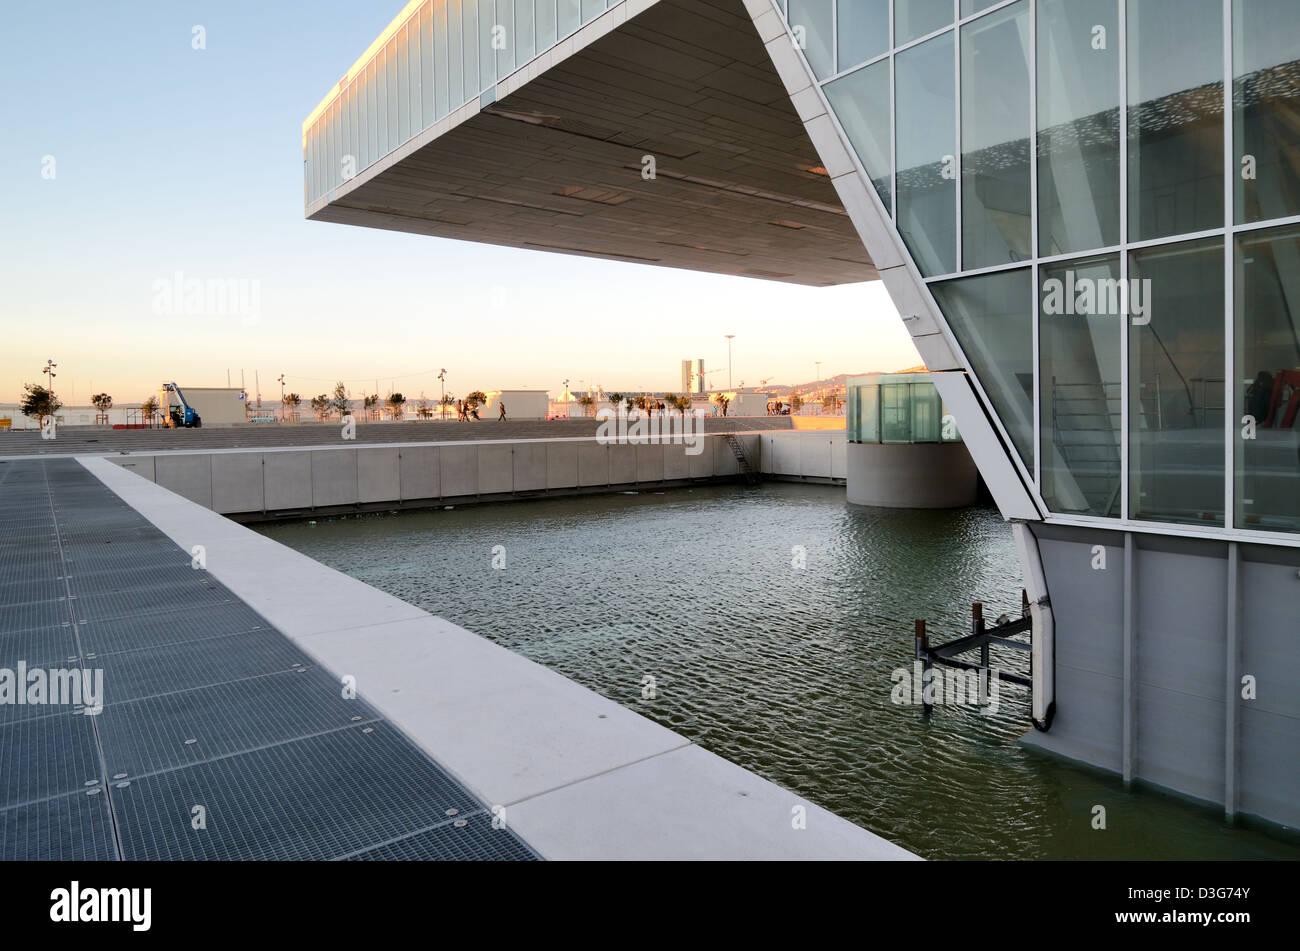 Villa Mediterranée Exhibition Hall by Stefano Boeri Marseille France - Stock Image